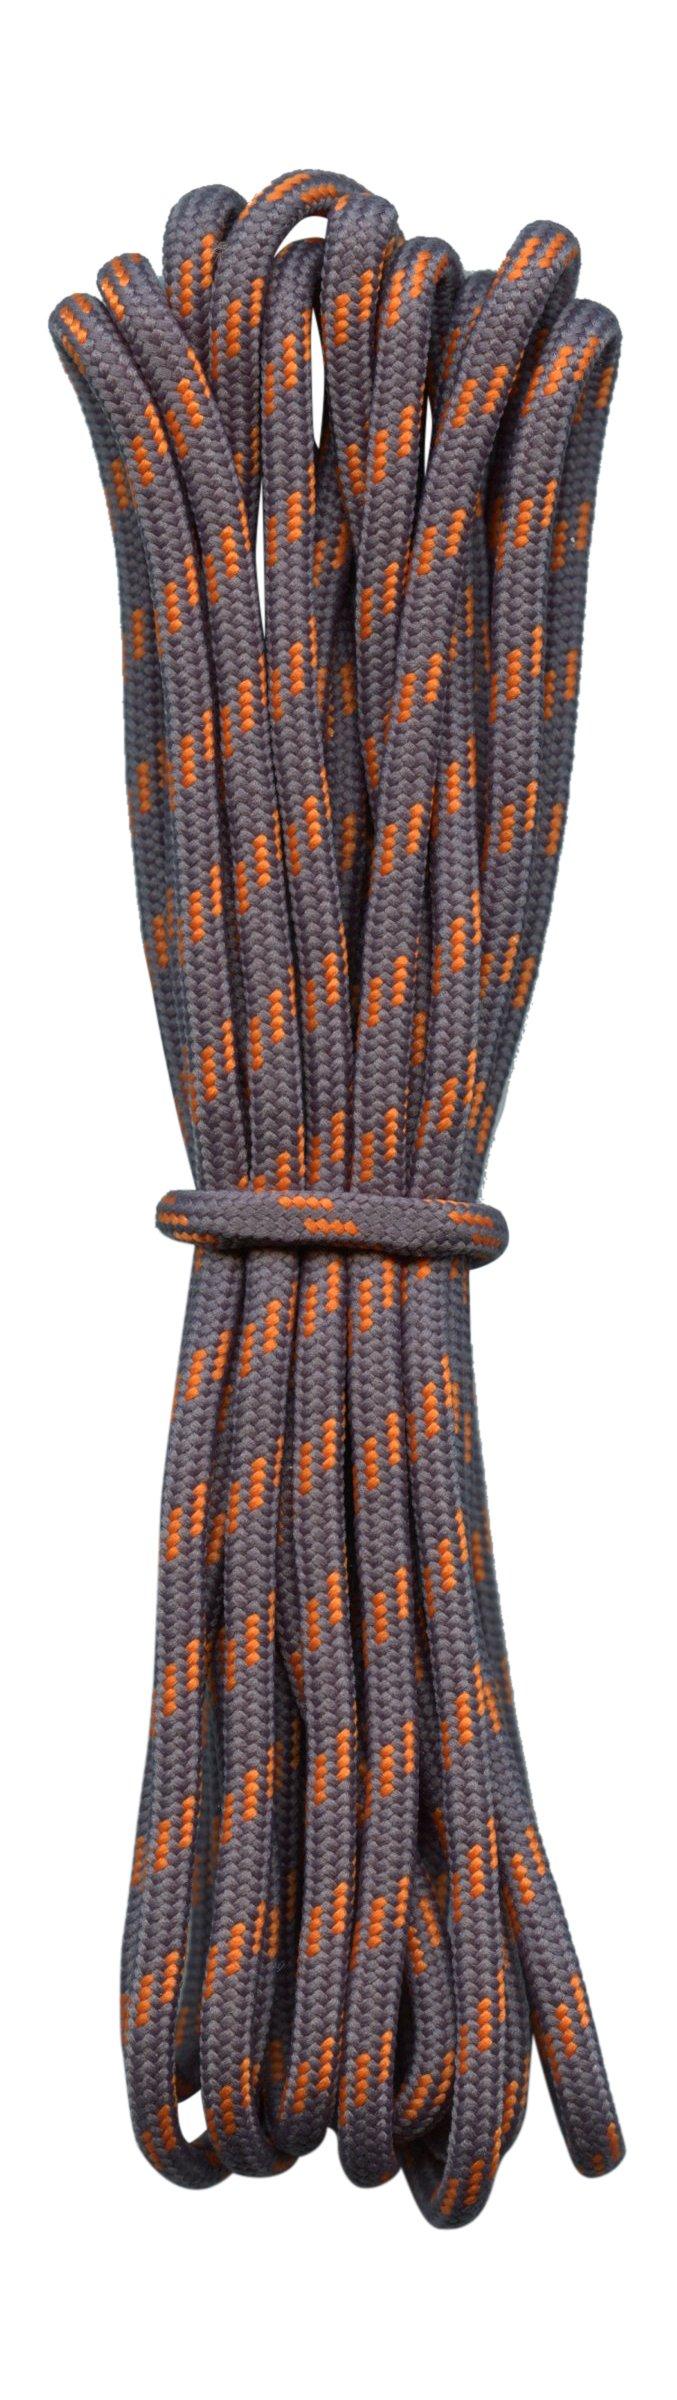 Hiking Boot Laces- grey with orange flecks - 3/16''diameter